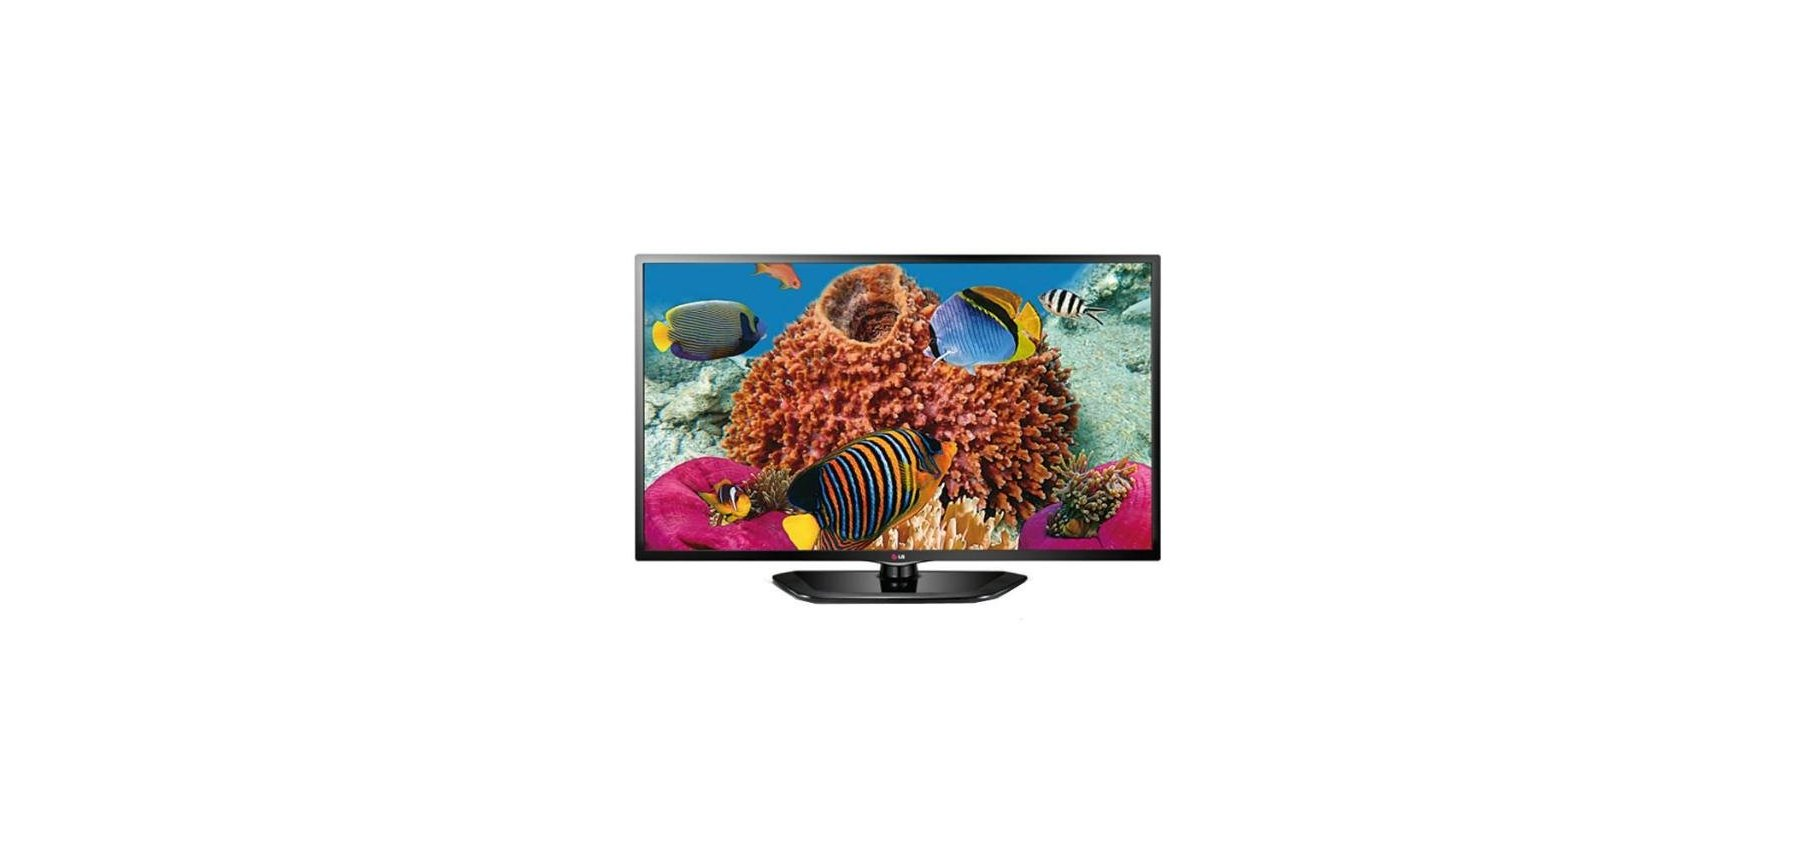 Telewizor LG 39LN5400/39CALI/SMART TV/Full HD 1920 x 1080